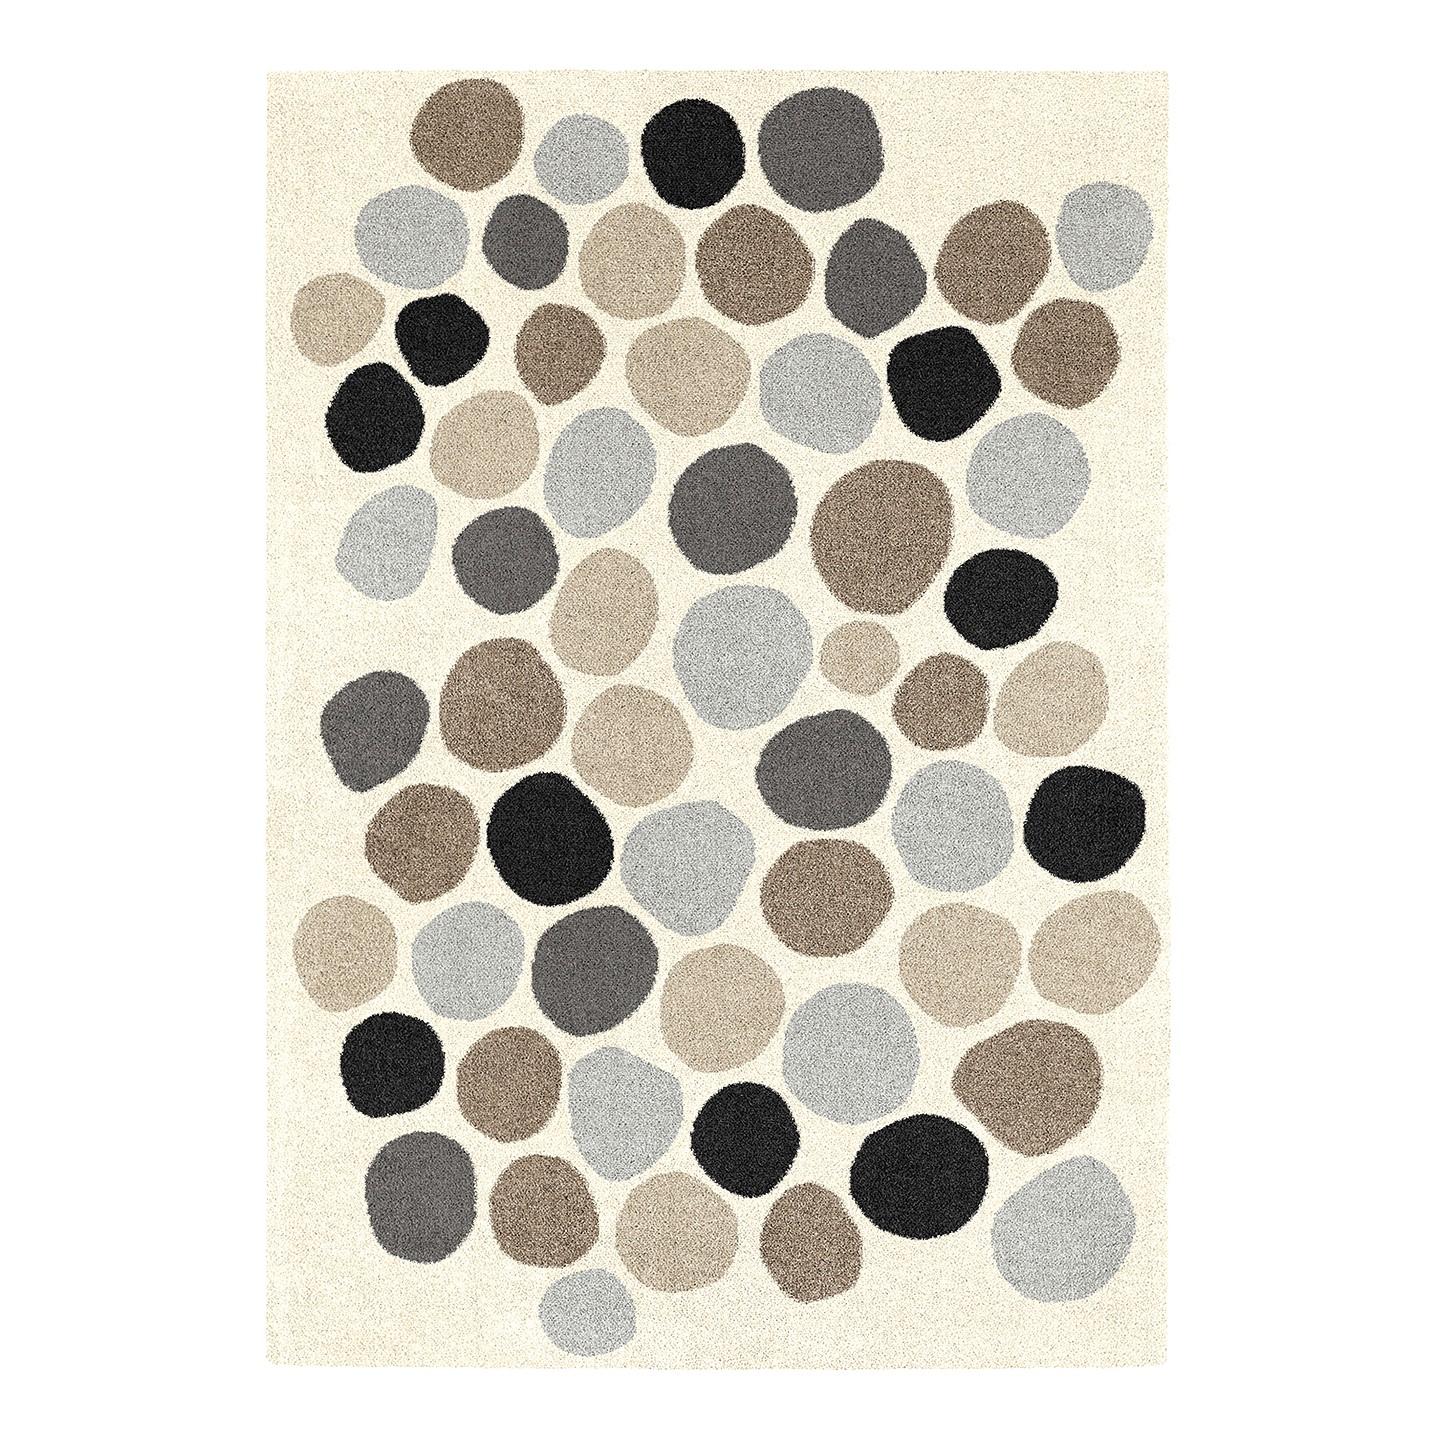 Teppich Play V - Kunstfaser - Creme / Grau - 120 x 170 cm, Top Square